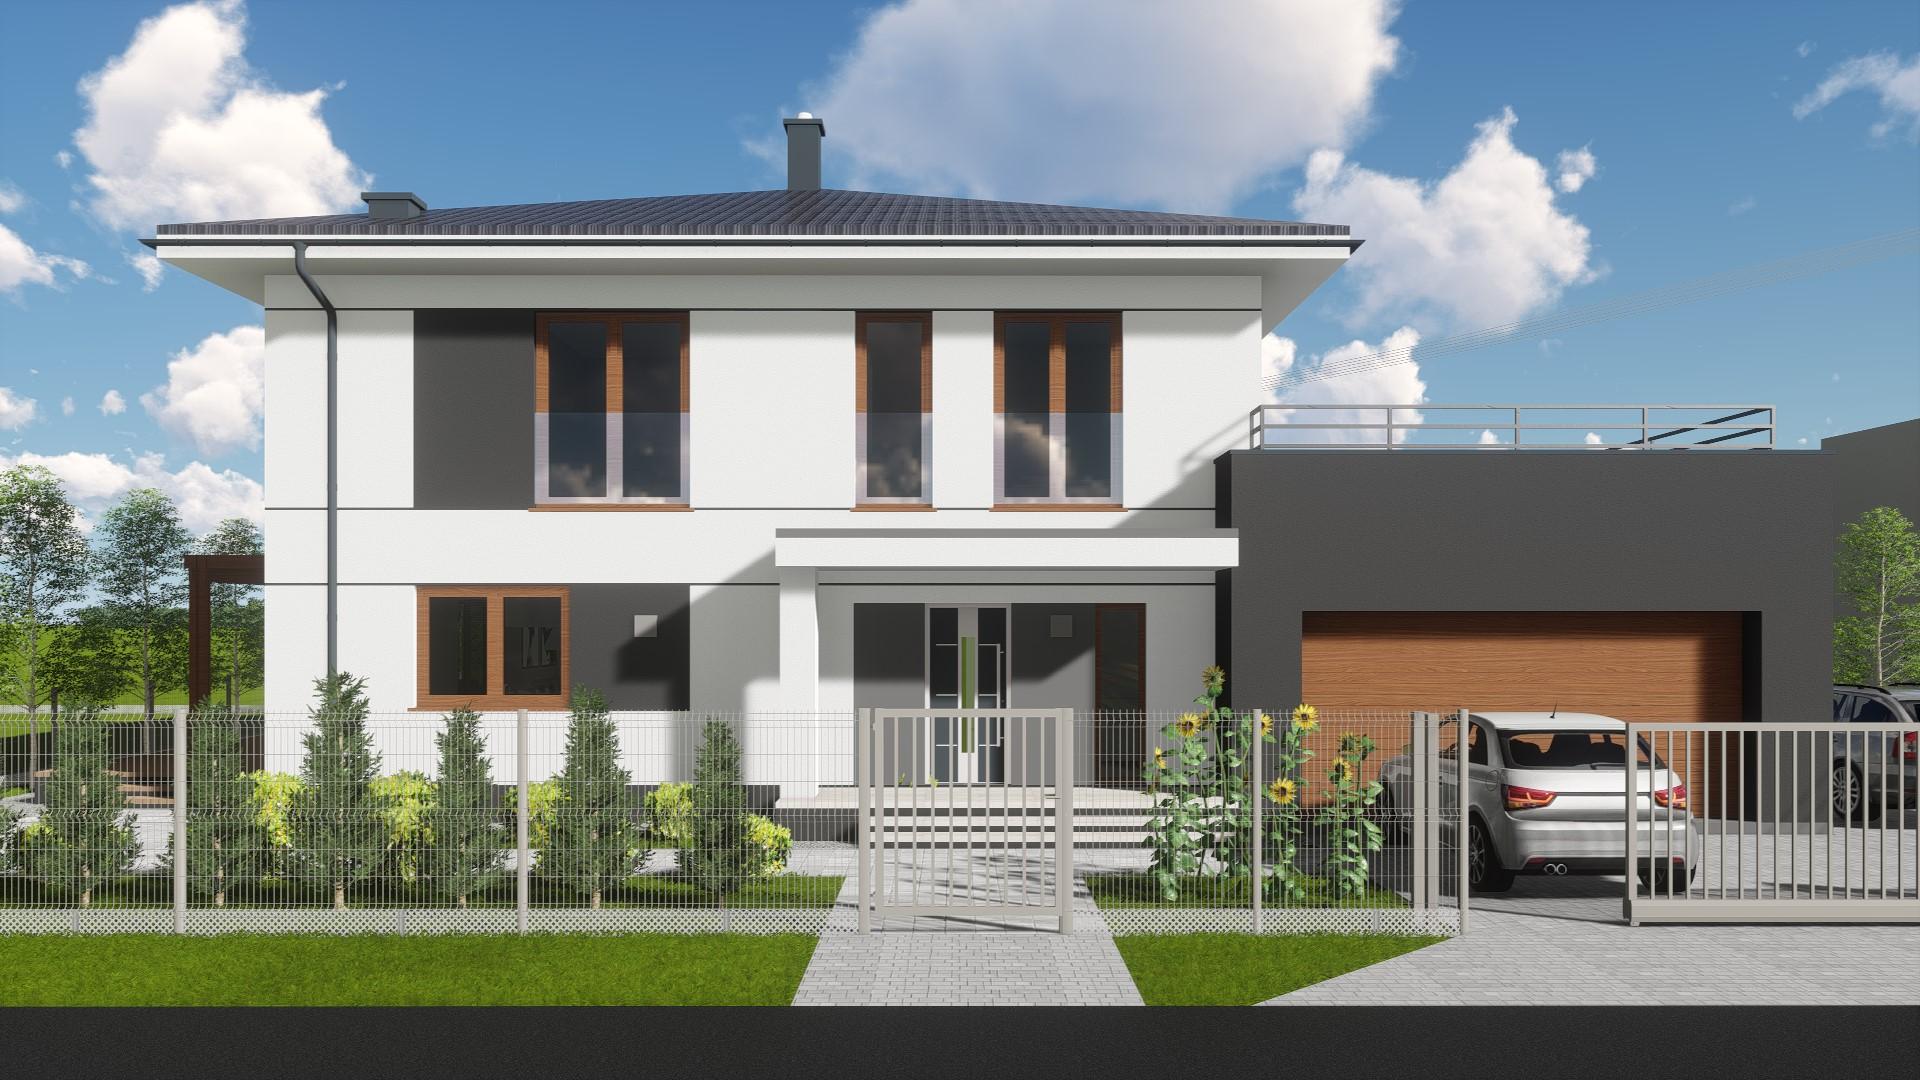 Parter + Piętro + Garaż - Bielowice